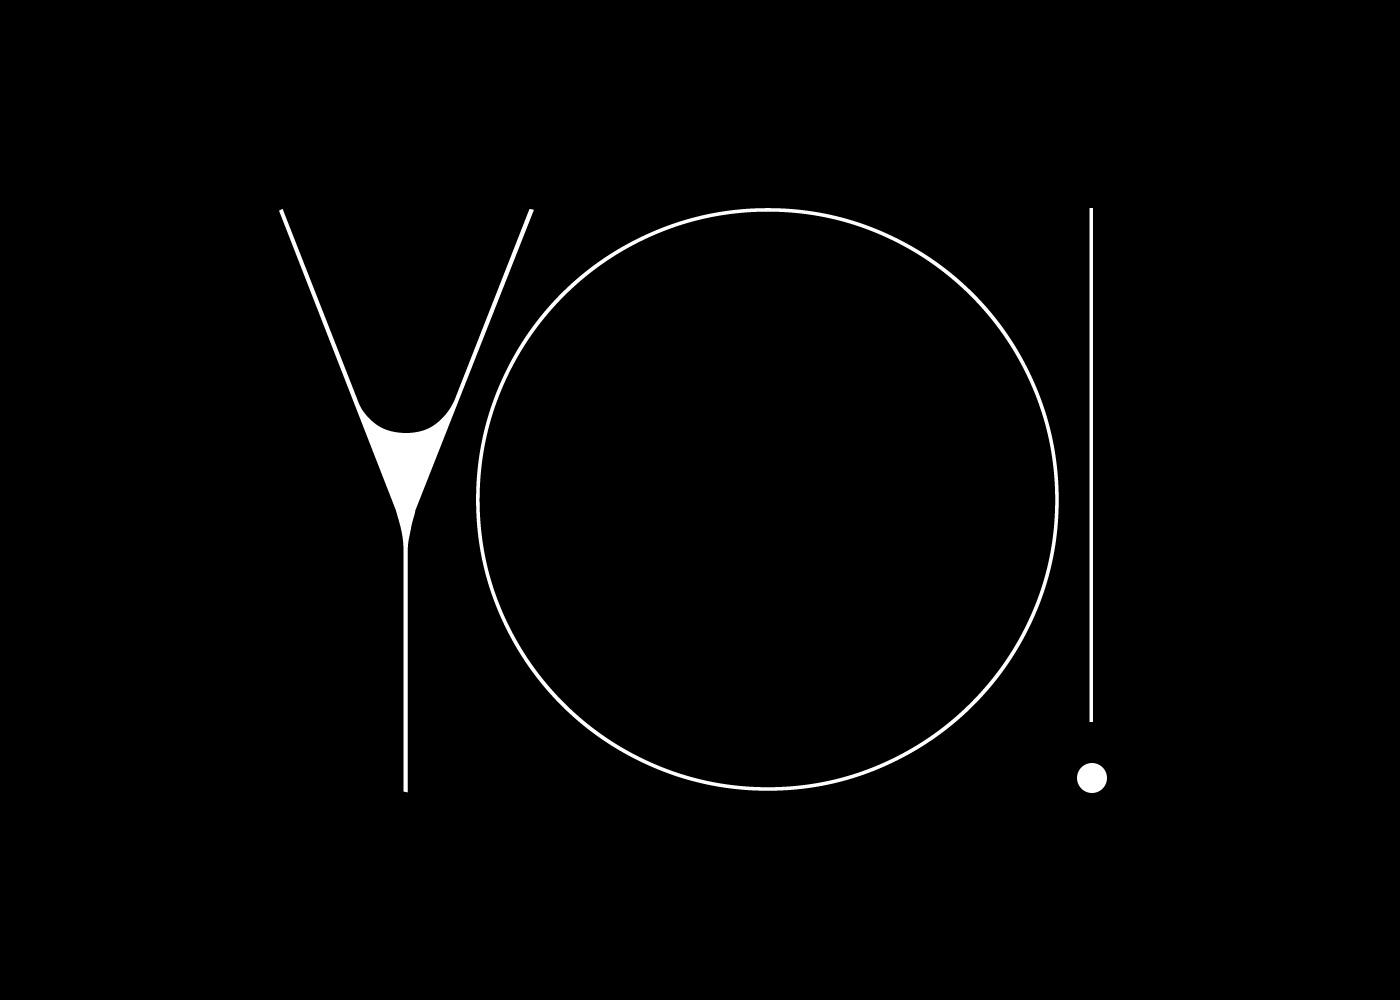 Adobe Portfolio,display typeface,free,free commercial,freebie,Classic,Neo Deco,elegant,Ultra Thin,Typeface,Free font,Nelson Balaban